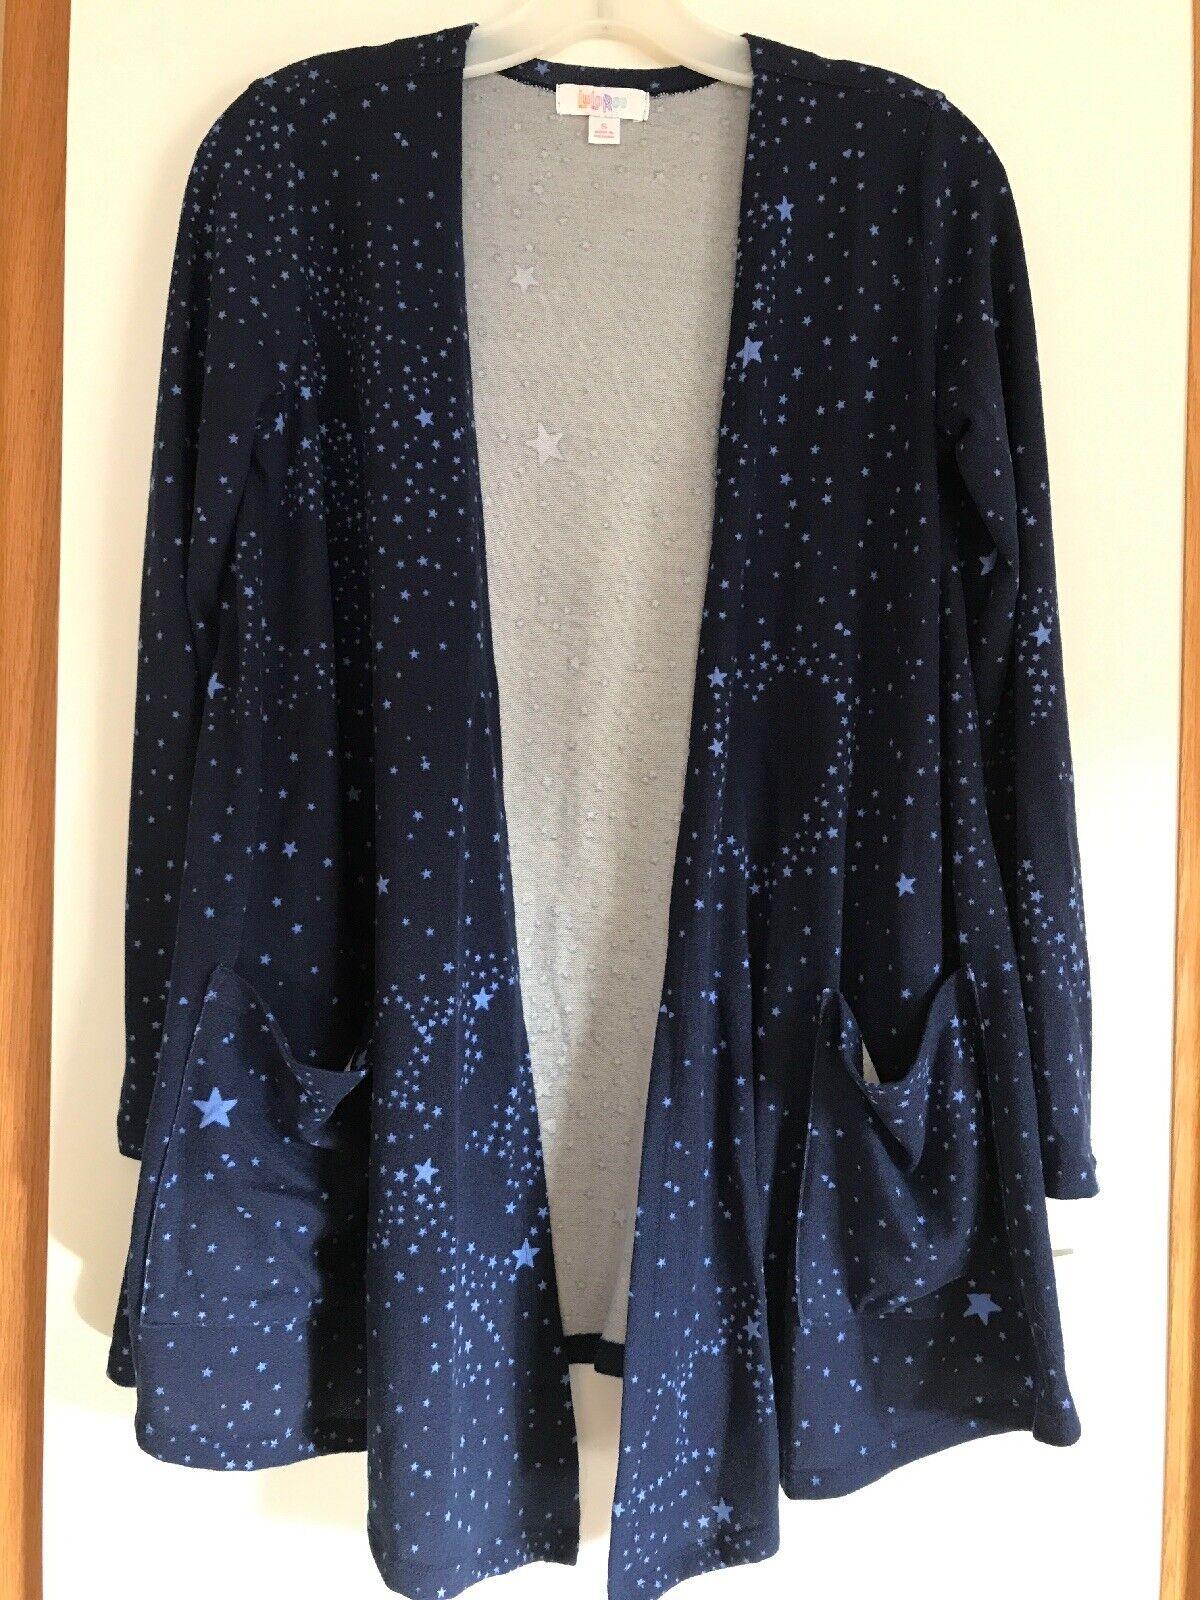 NWT - S LuLaRoe Caroline Cardigan-Happy Hearts Club bluee Stars-Constellations